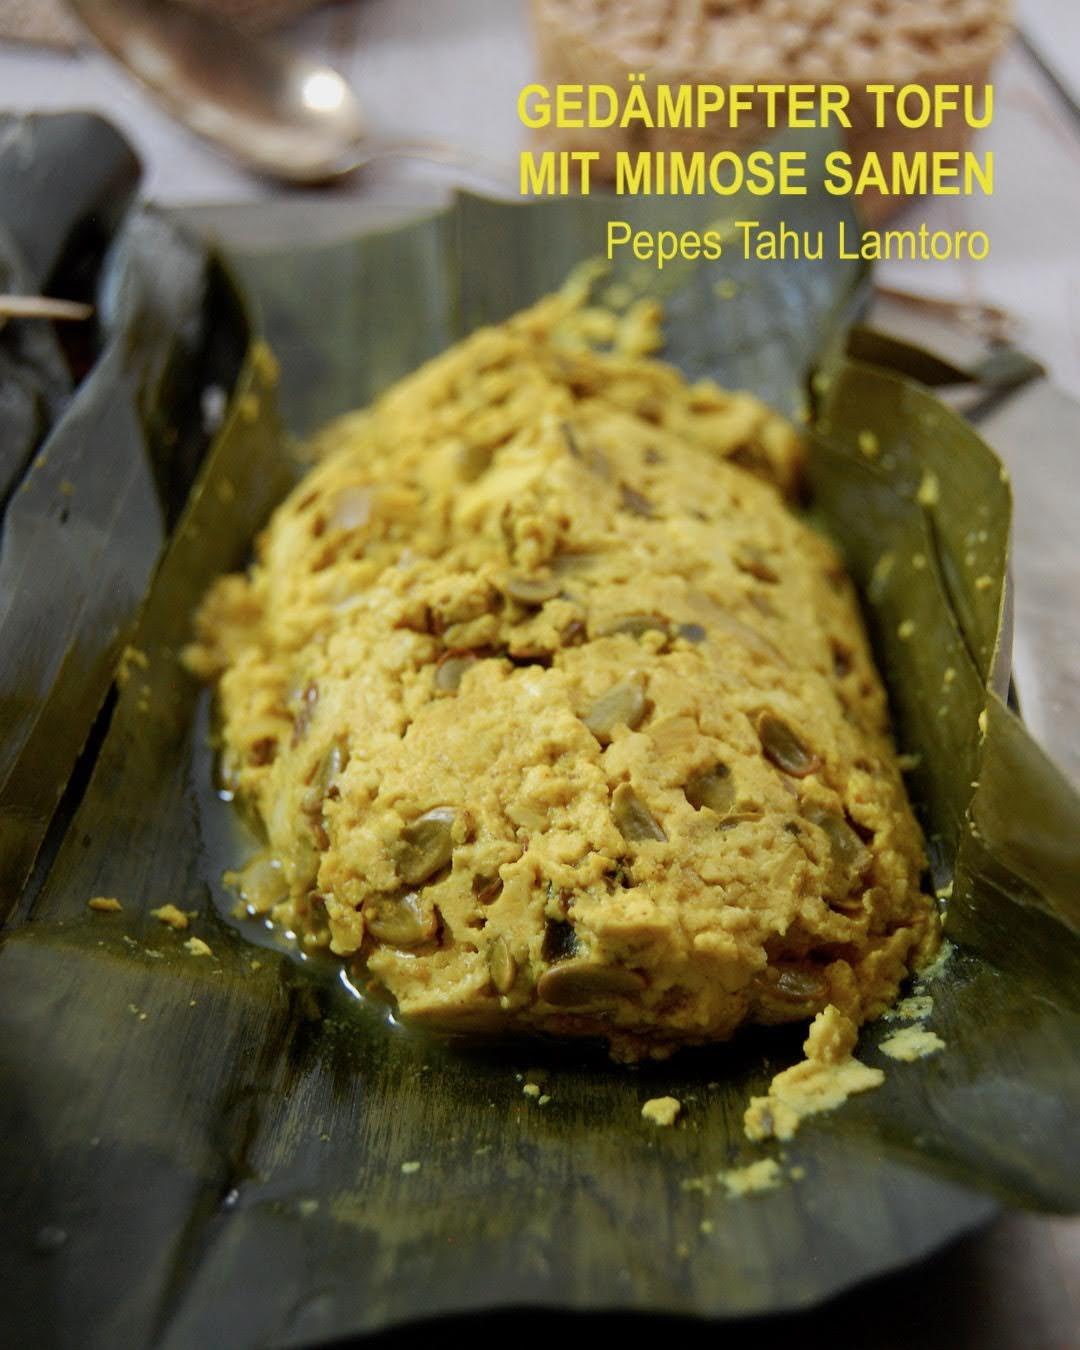 Gedämpfter Tofu mit Mimose Samen, Pepes Tahu Lamtoro